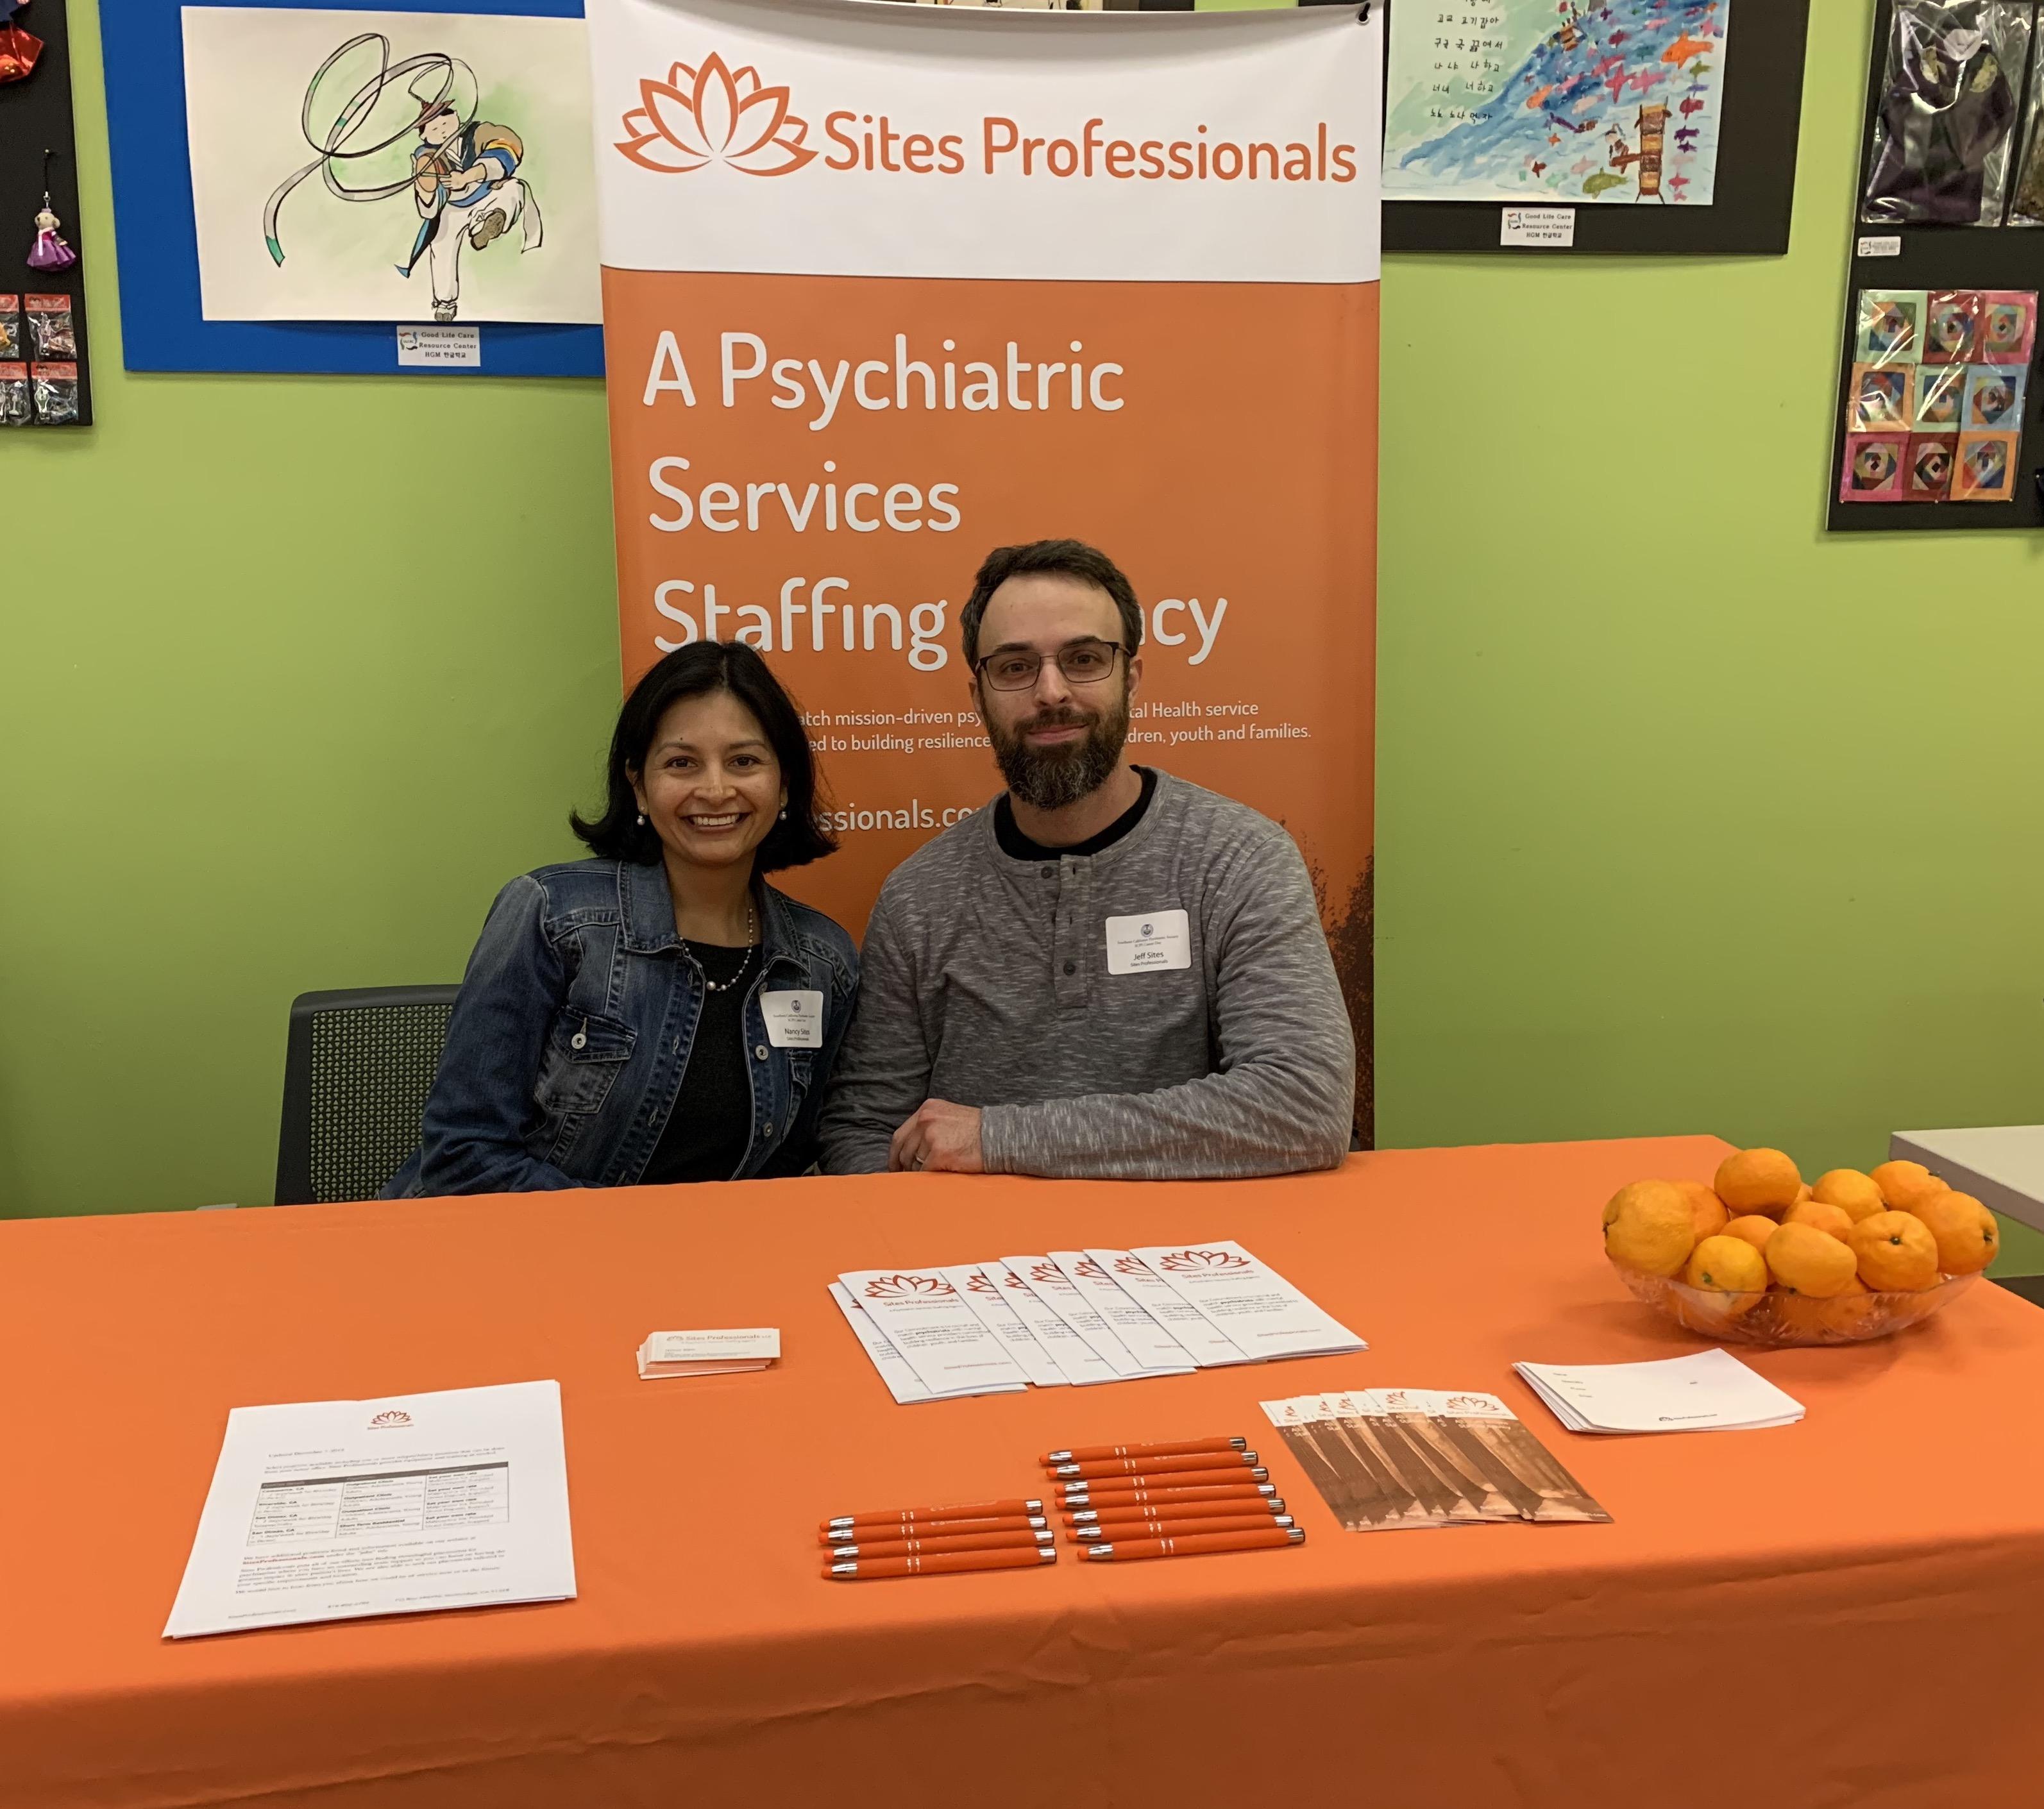 Psychiatric Society Career Fair Sites Professionals